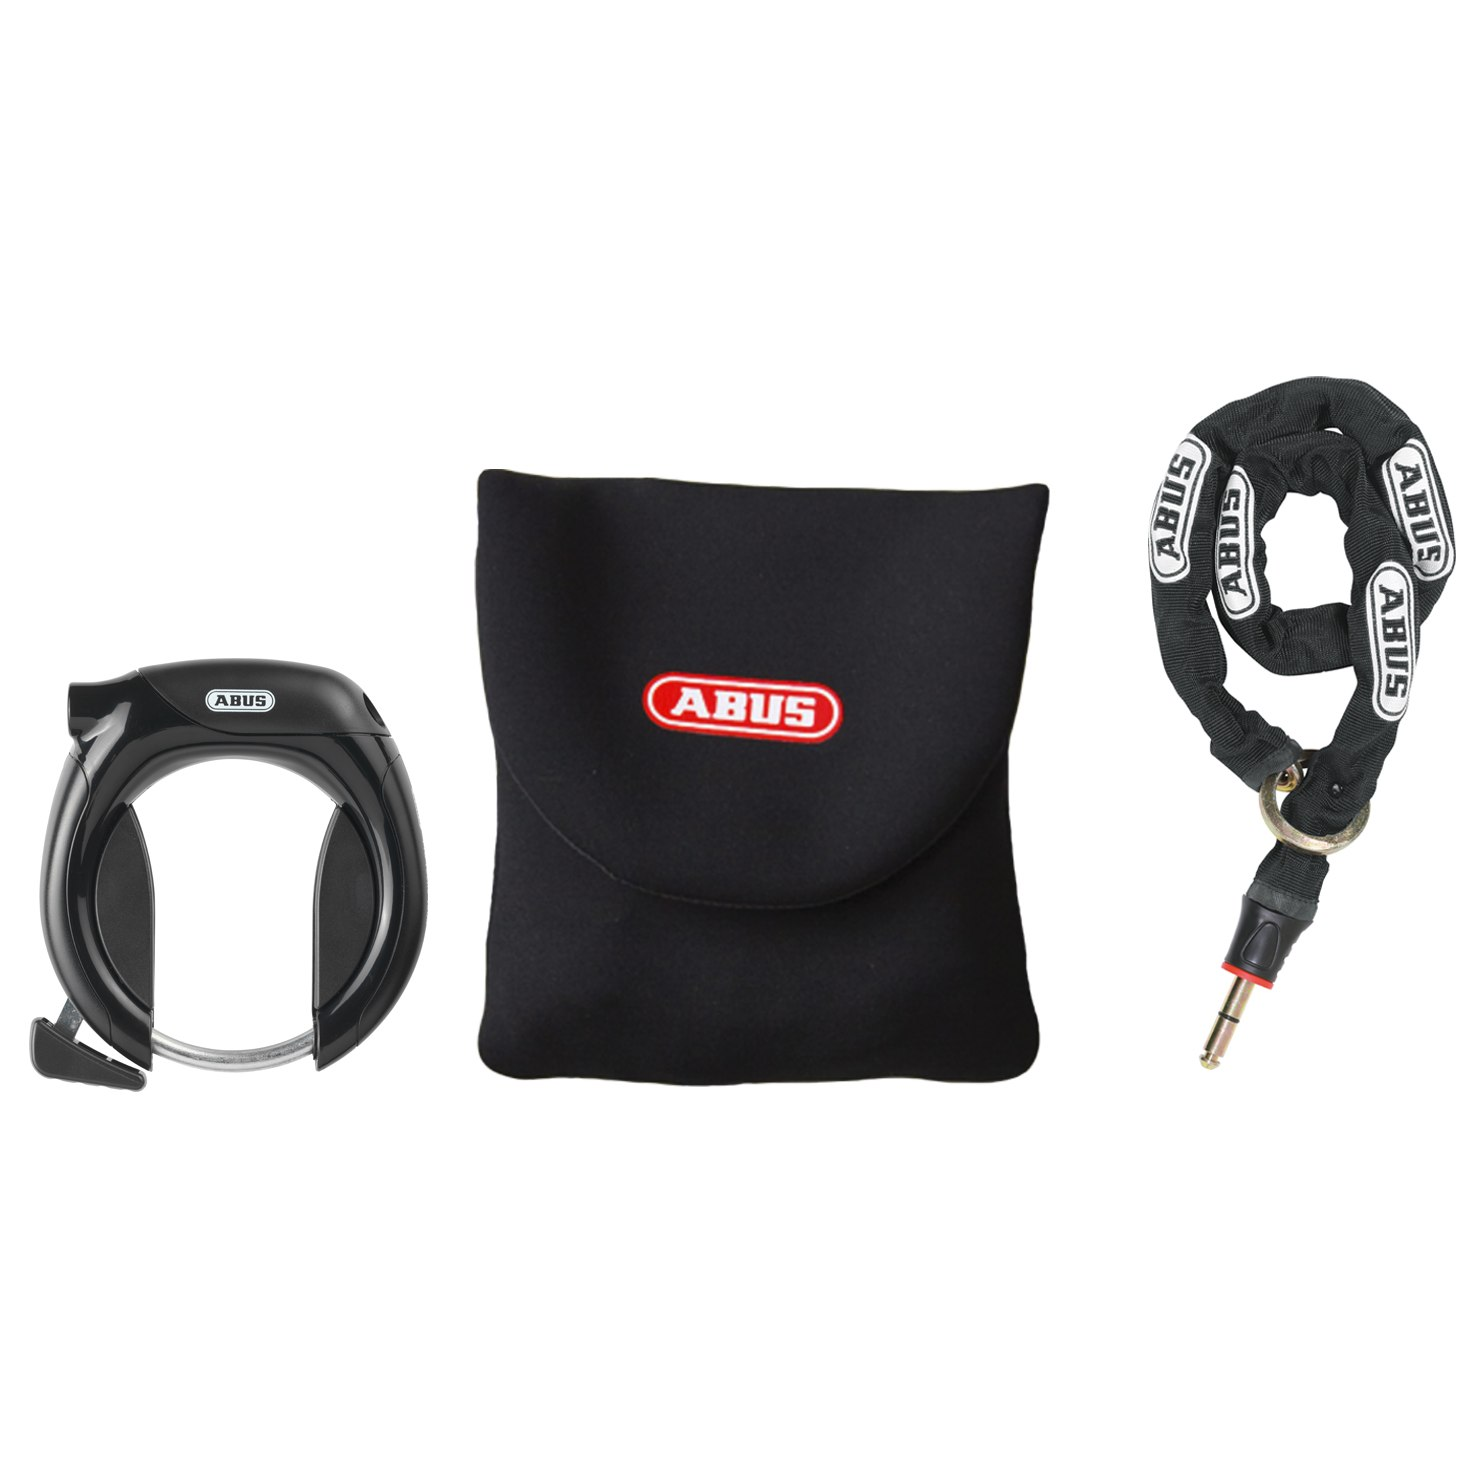 ABUS Pro Tectic 4960 Frame Lock + 6KS/85 Chain + ST4850 Bag